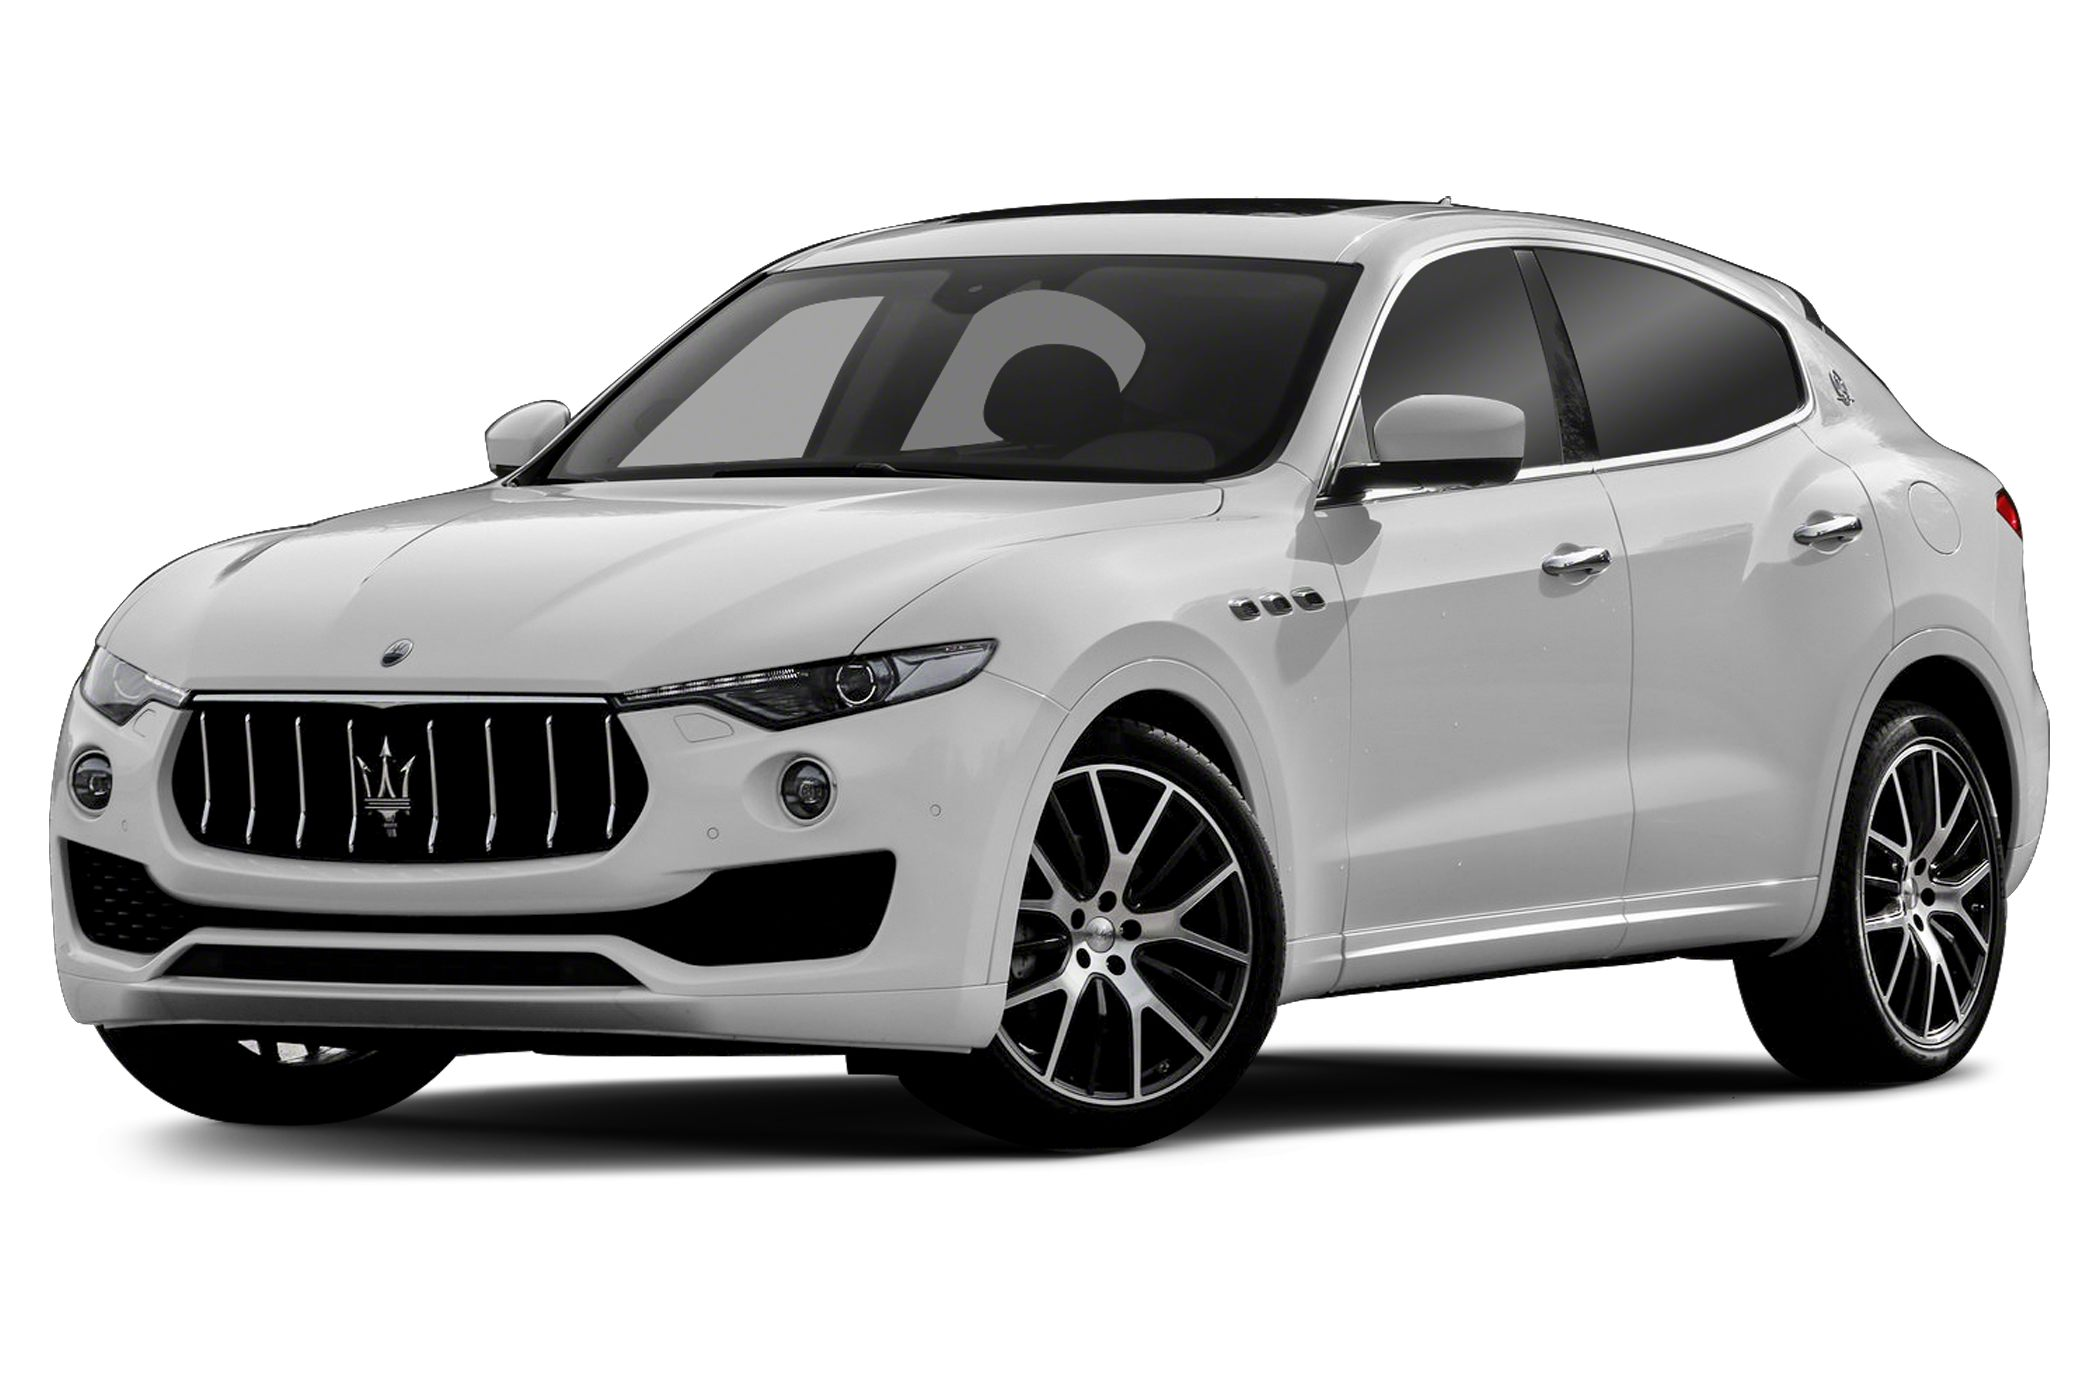 2020 Maserati Levante Specs And Prices